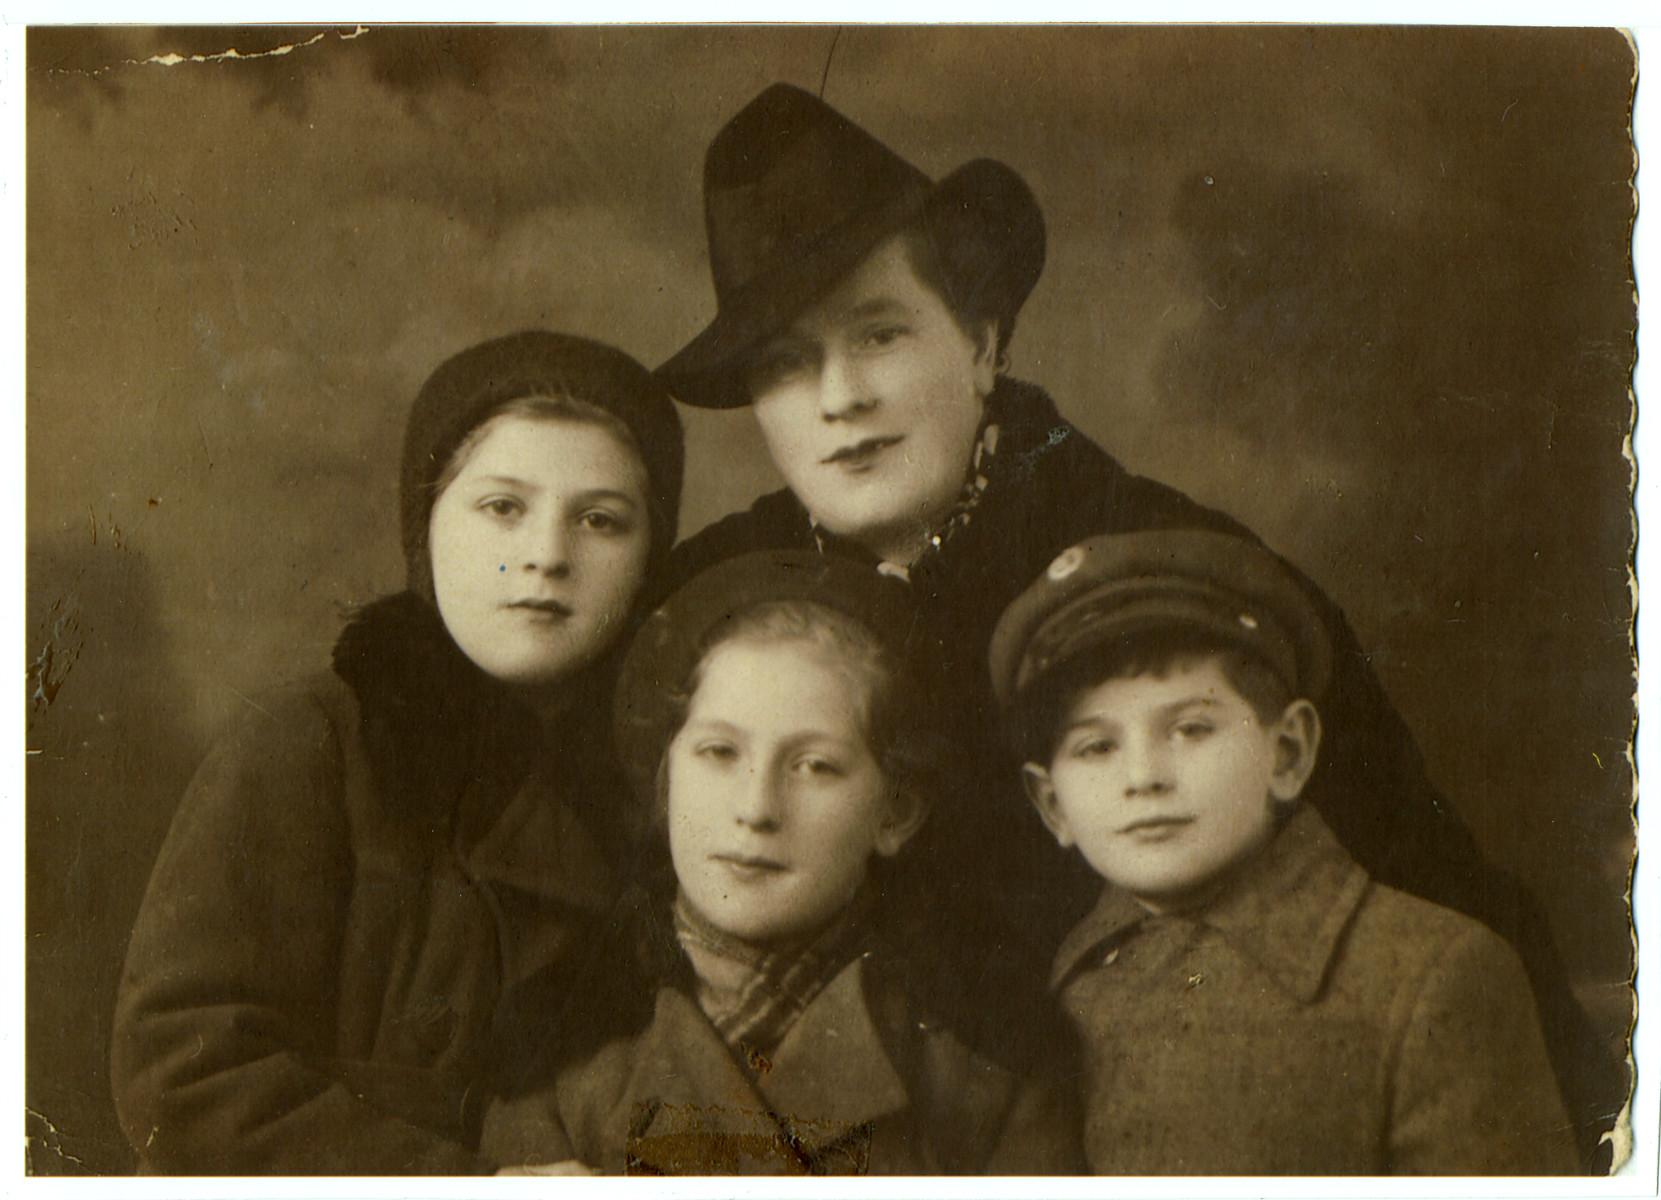 Studio portrait of Sara Fogelman and her three children in prewar Radomsko, Poland, shortly before the war.  Pictured are Pola (left), Genia (bottom), Abraham Joseph (far right), and their mother Sara (top.)